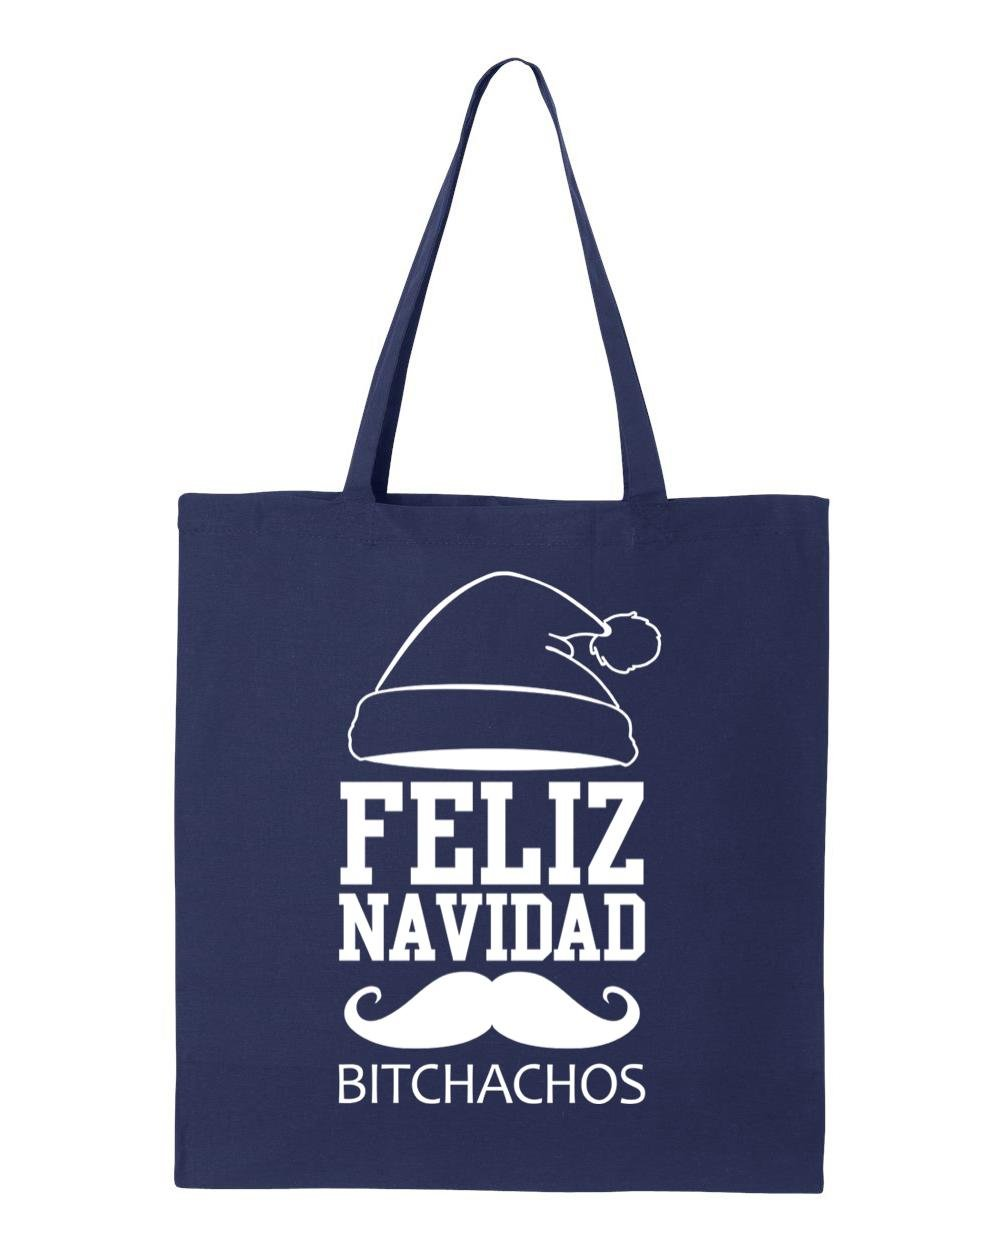 shop4ever Feliz Navidad BitchachosホワイトトートバッグMerry Christmas再利用可能なショッピングバッグ6オンスコットンキャンバス 6 oz ブルー S4E_1215_FelizWht_TB_8502_Navy_3 B072NZCFMV  ネイビー